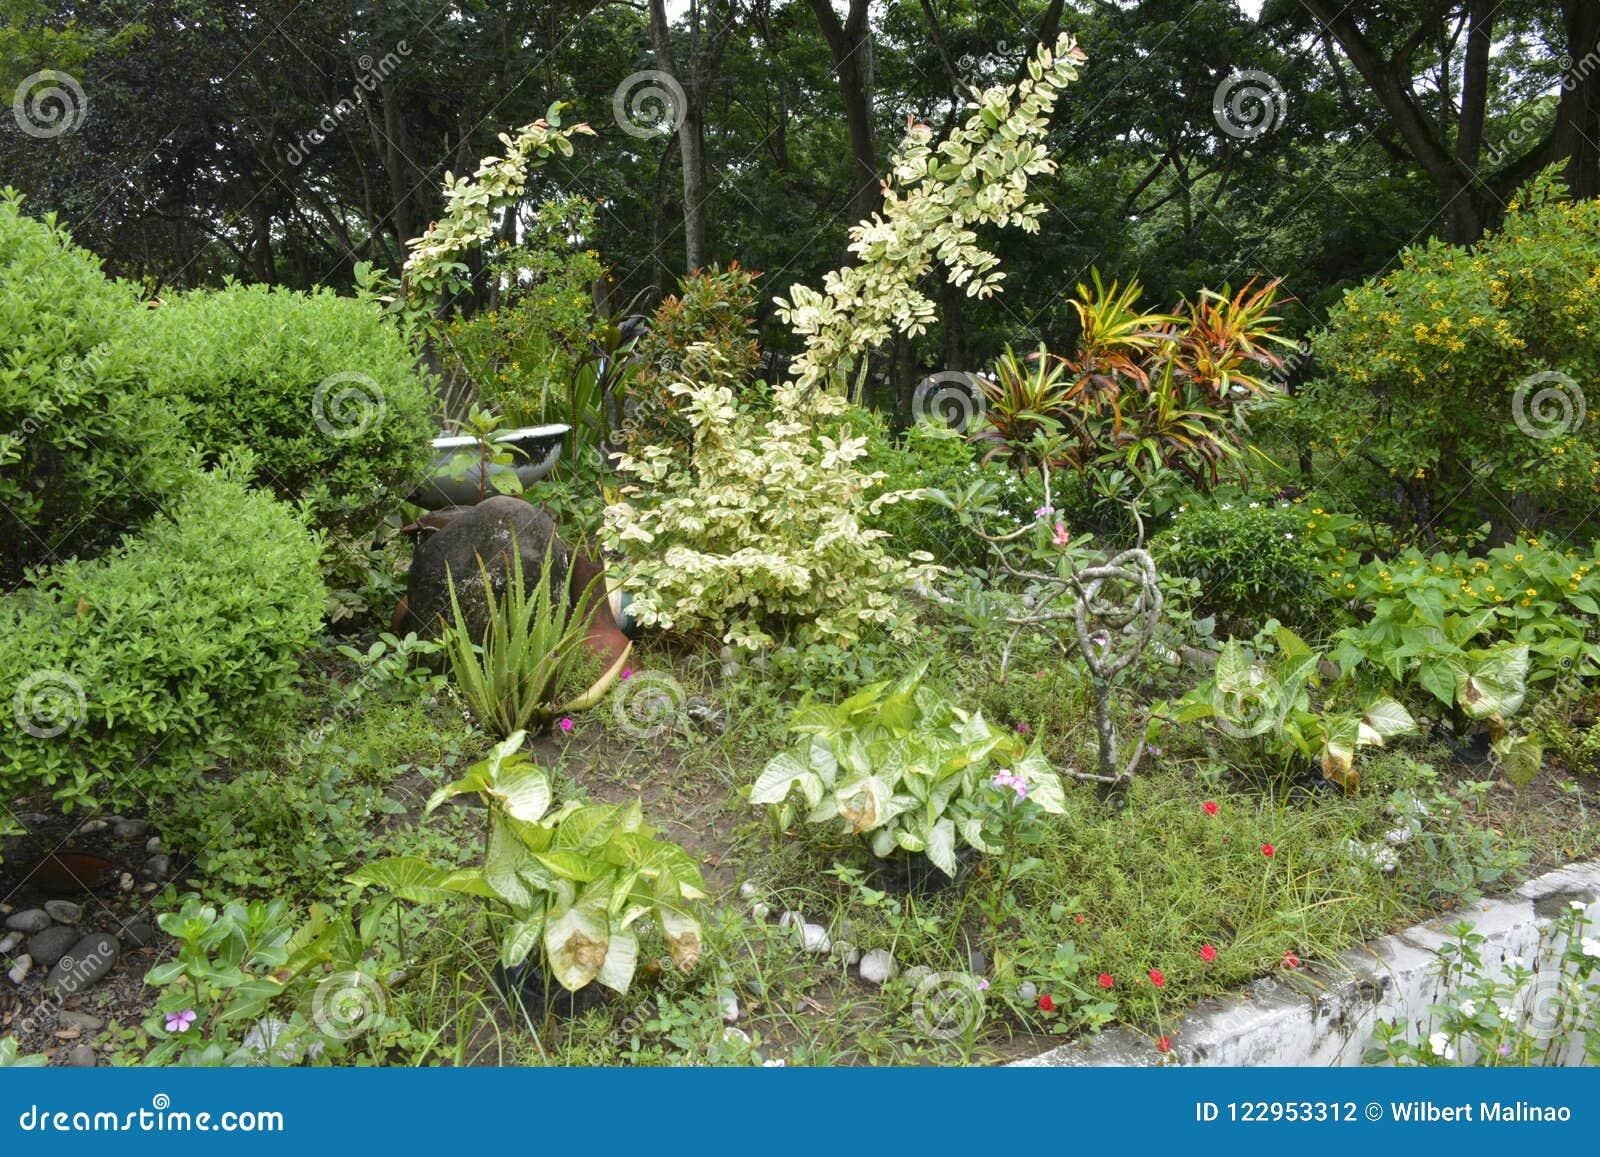 Matanao,南达沃省,菲律宾的市政霍尔的前提的栽培植物